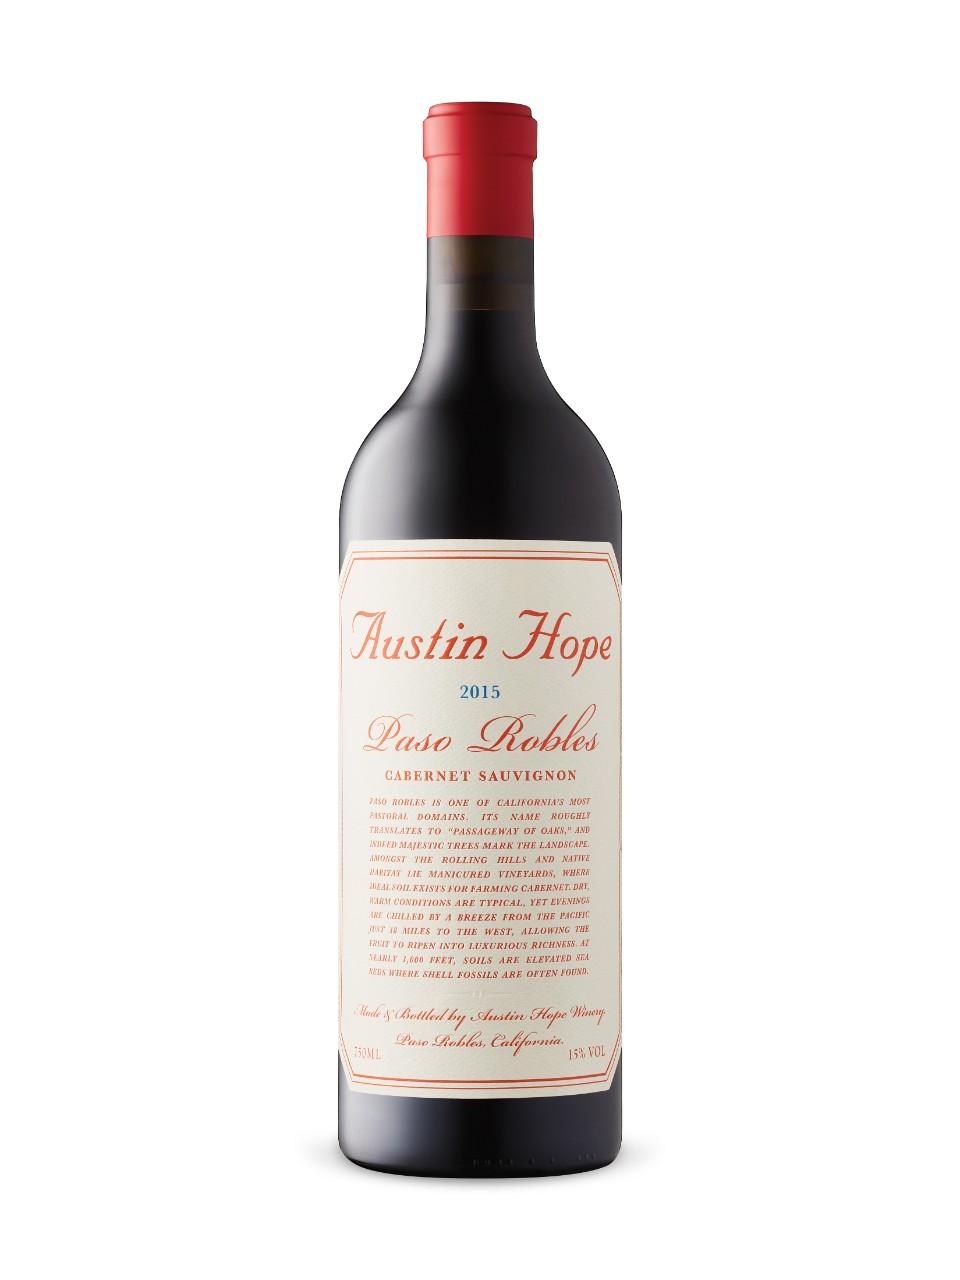 Austin Hope Cabernet Sauvignon 2015 Lcbo